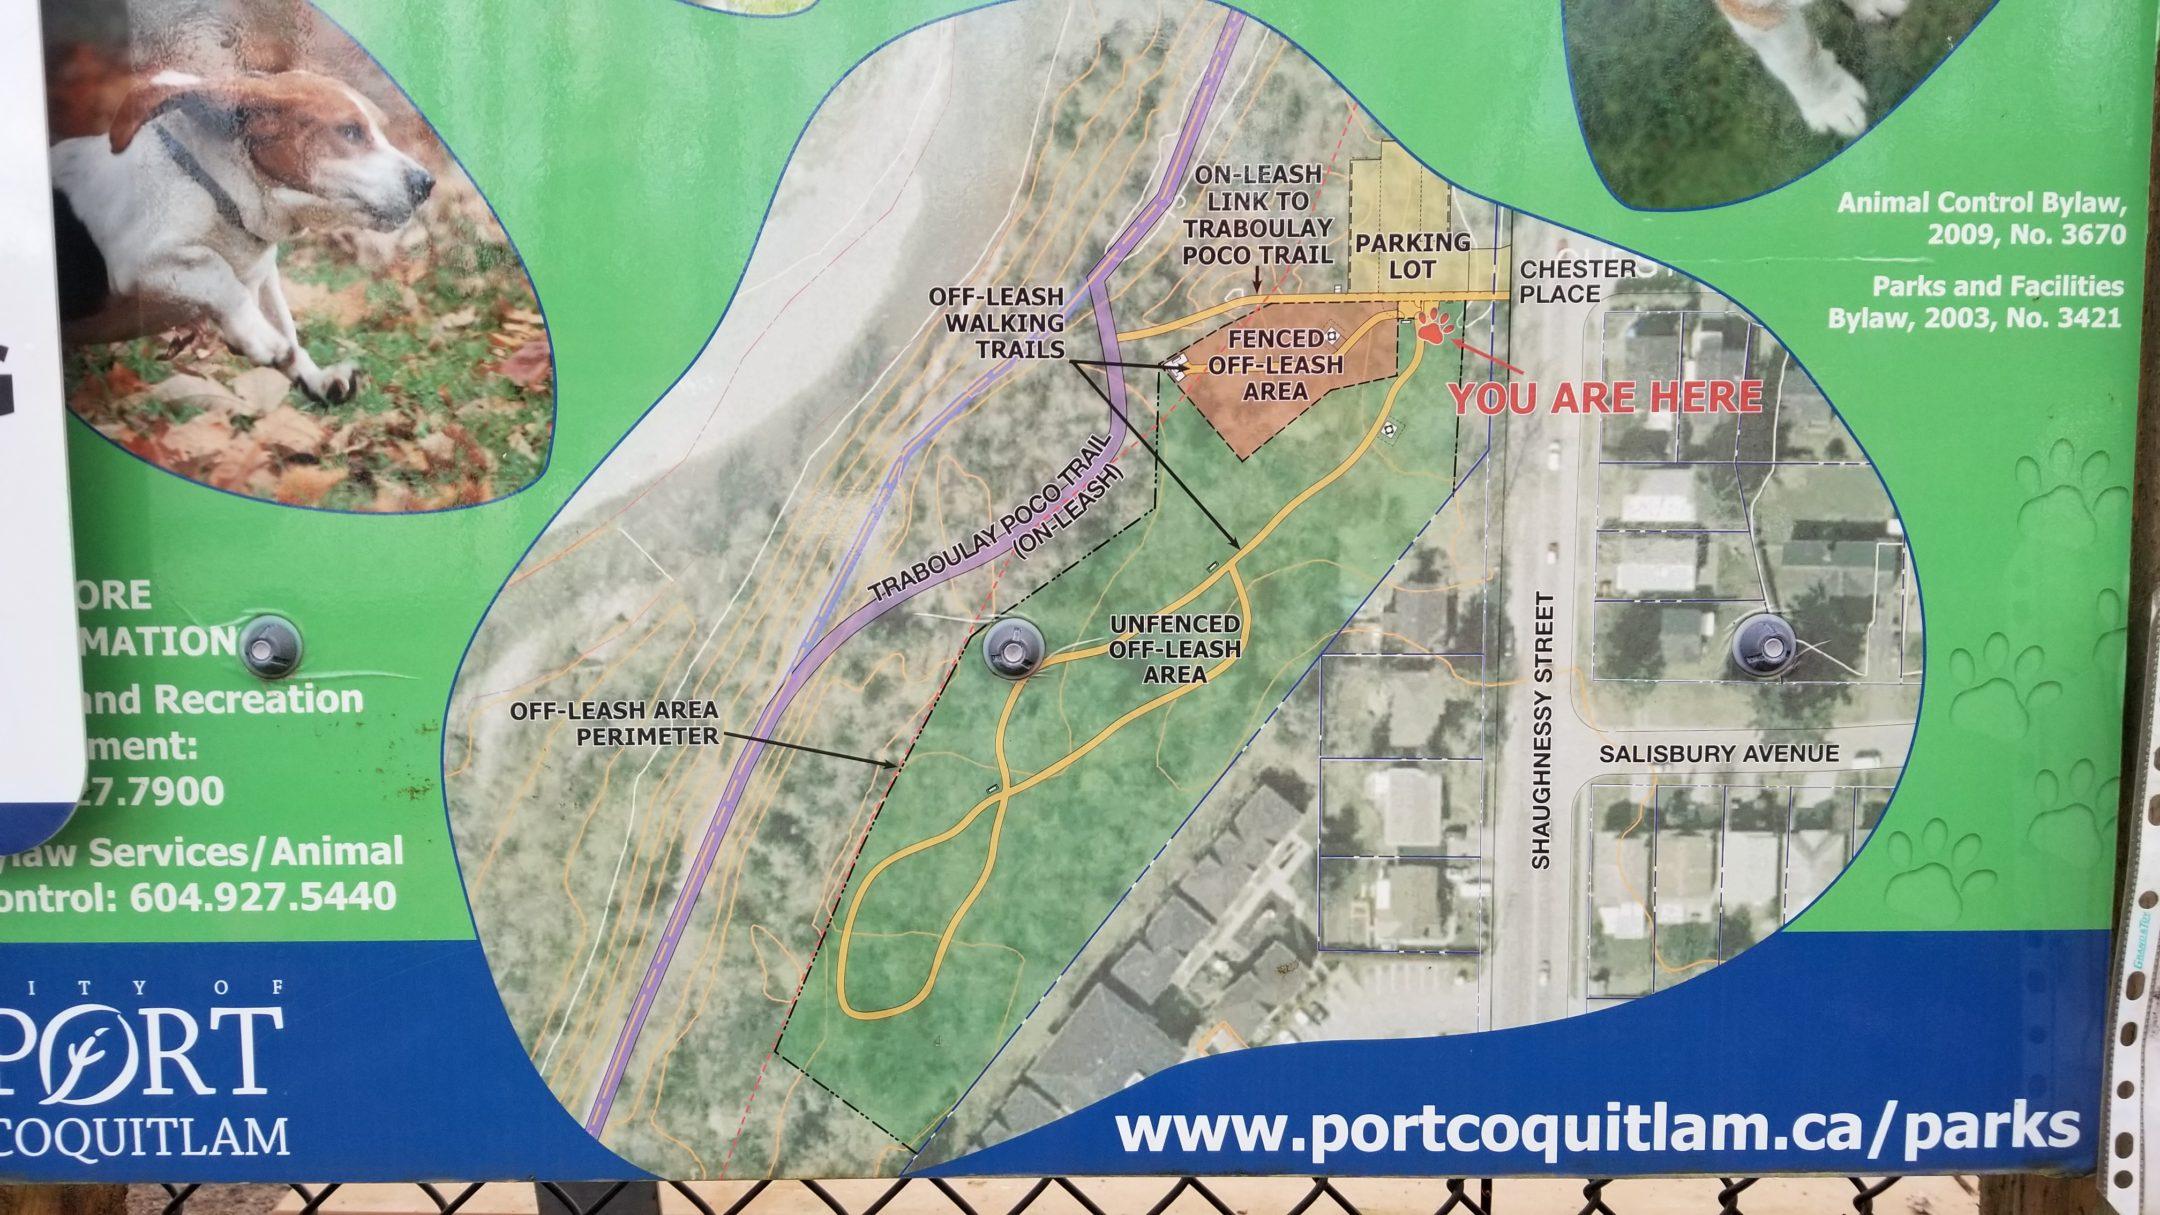 Shaughnessy Park Off-Leash Dog Park - Port Coquitlam - BC (12) - Park Map